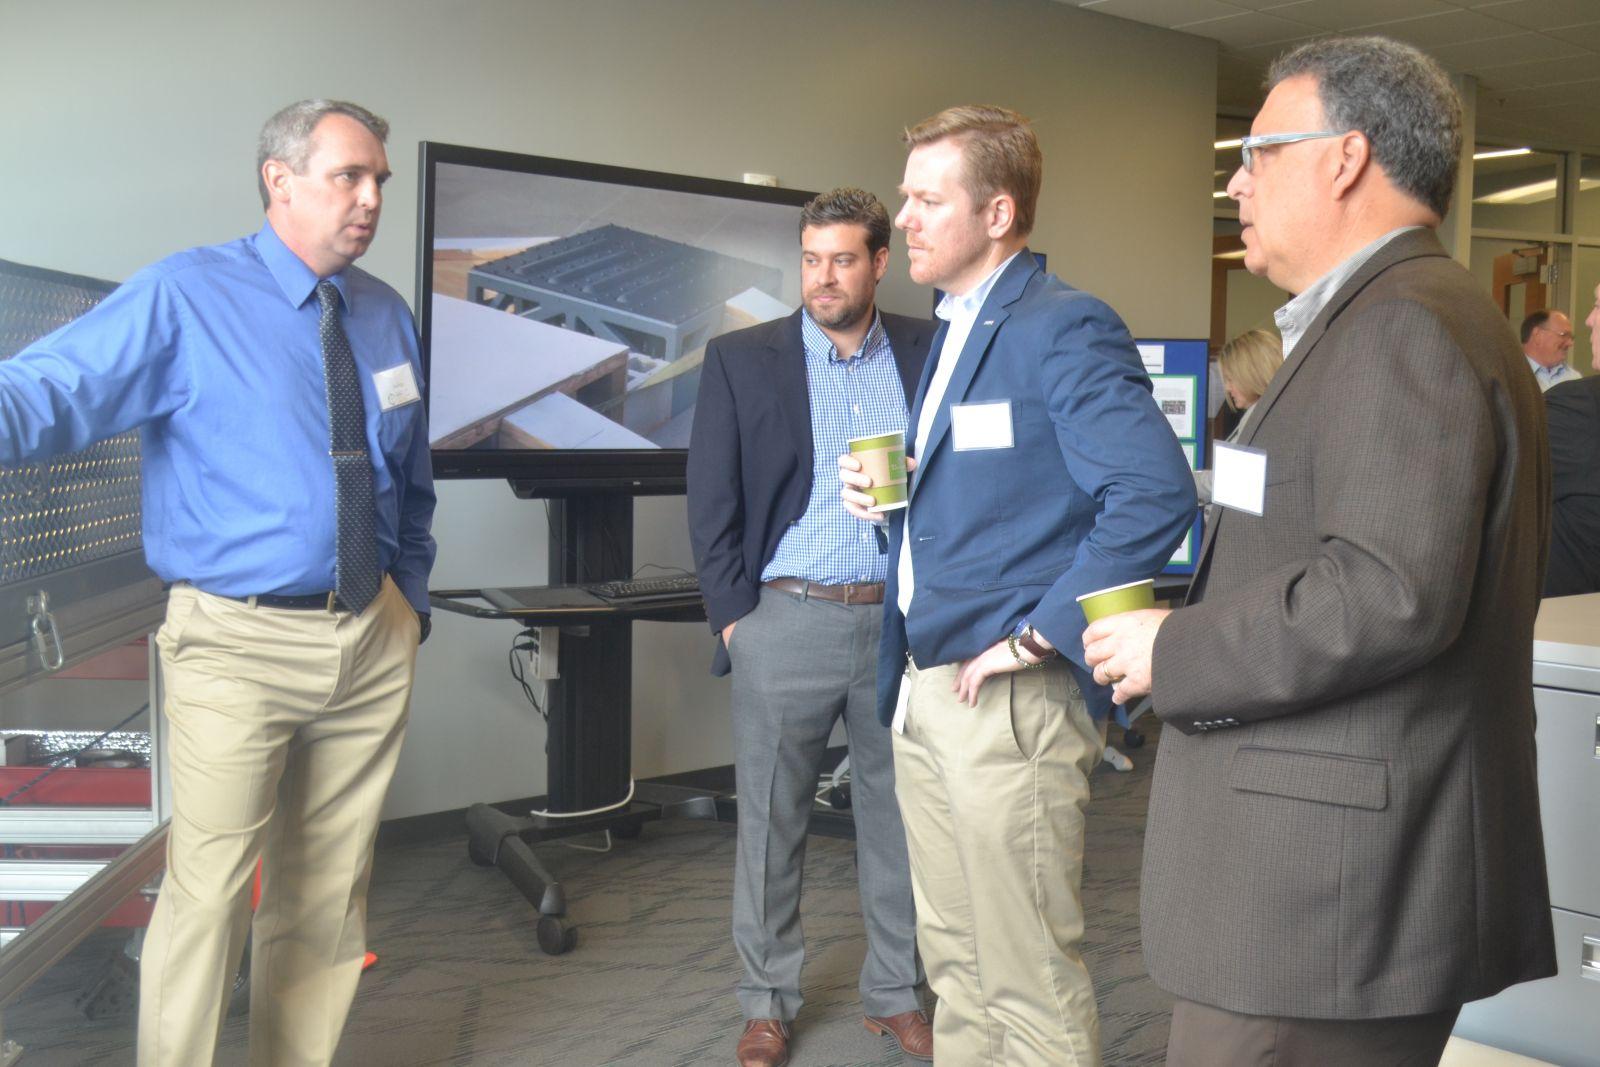 Greenville Tech's CMI launches business incubator